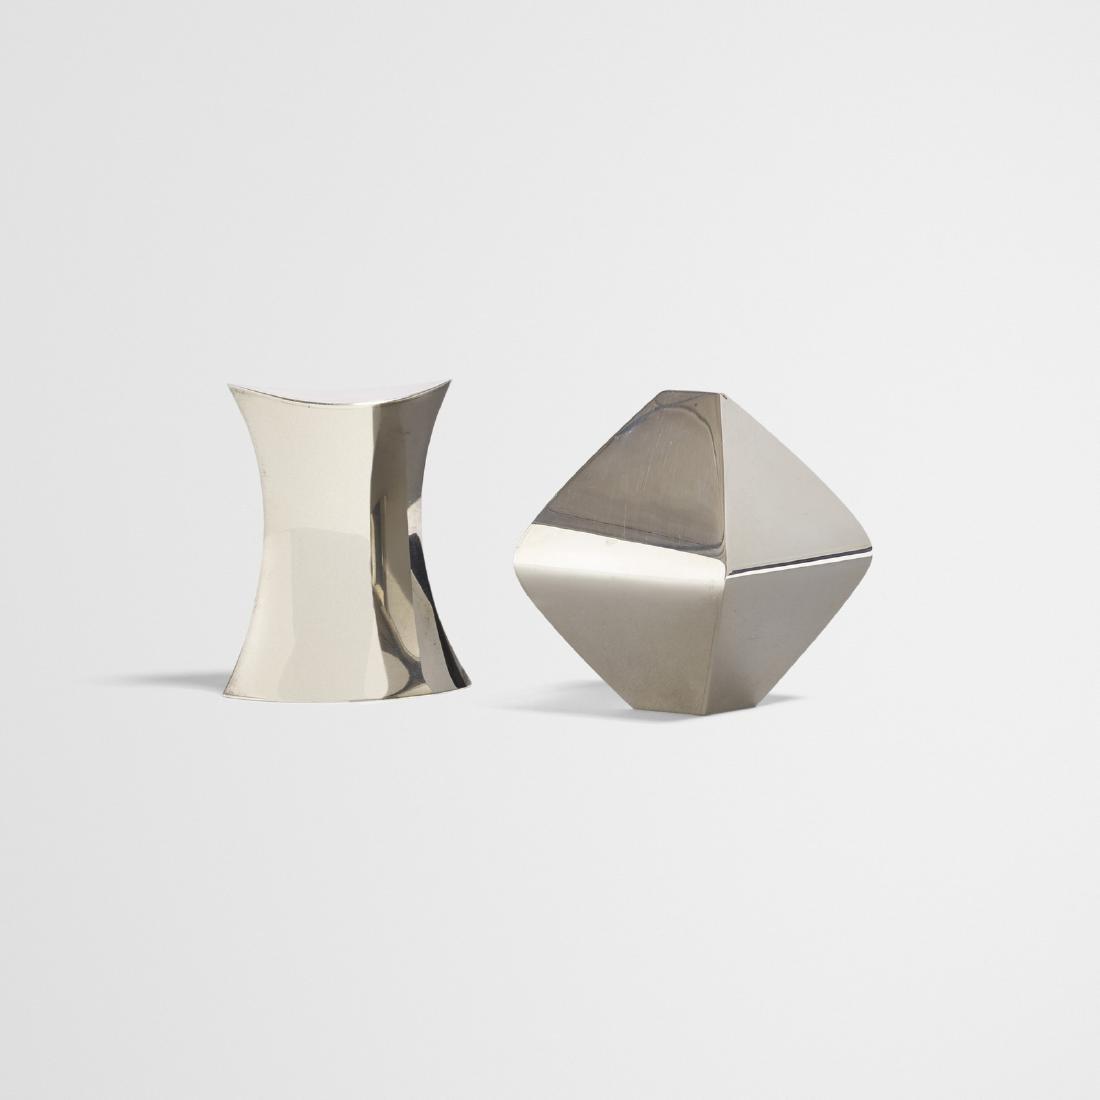 John Prip, prototype Diamond salt and pepper shakers